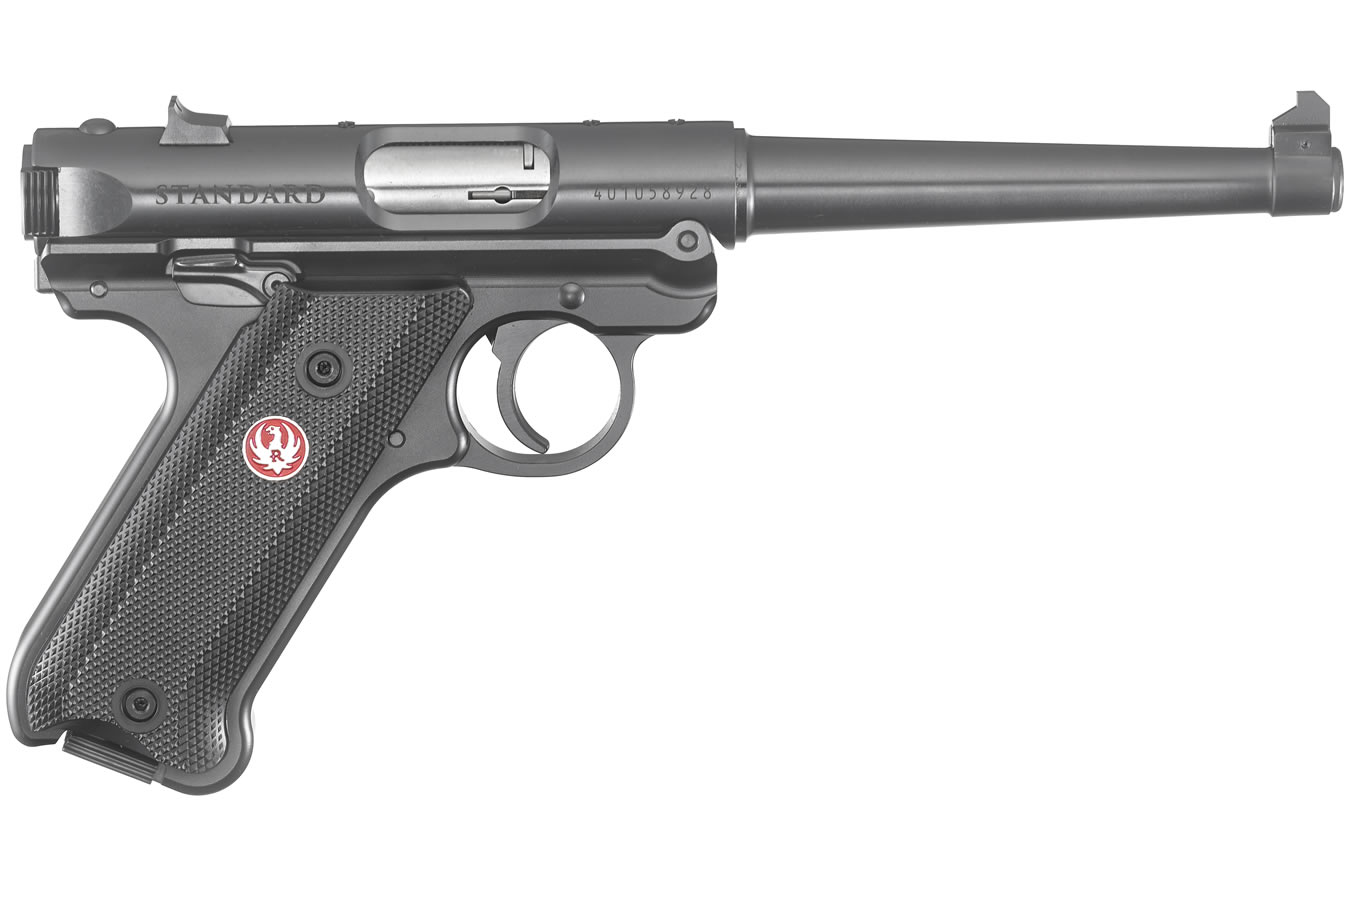 Ruger Mark Iv Standard 22lr Rimfire Pistol With 6 Inch